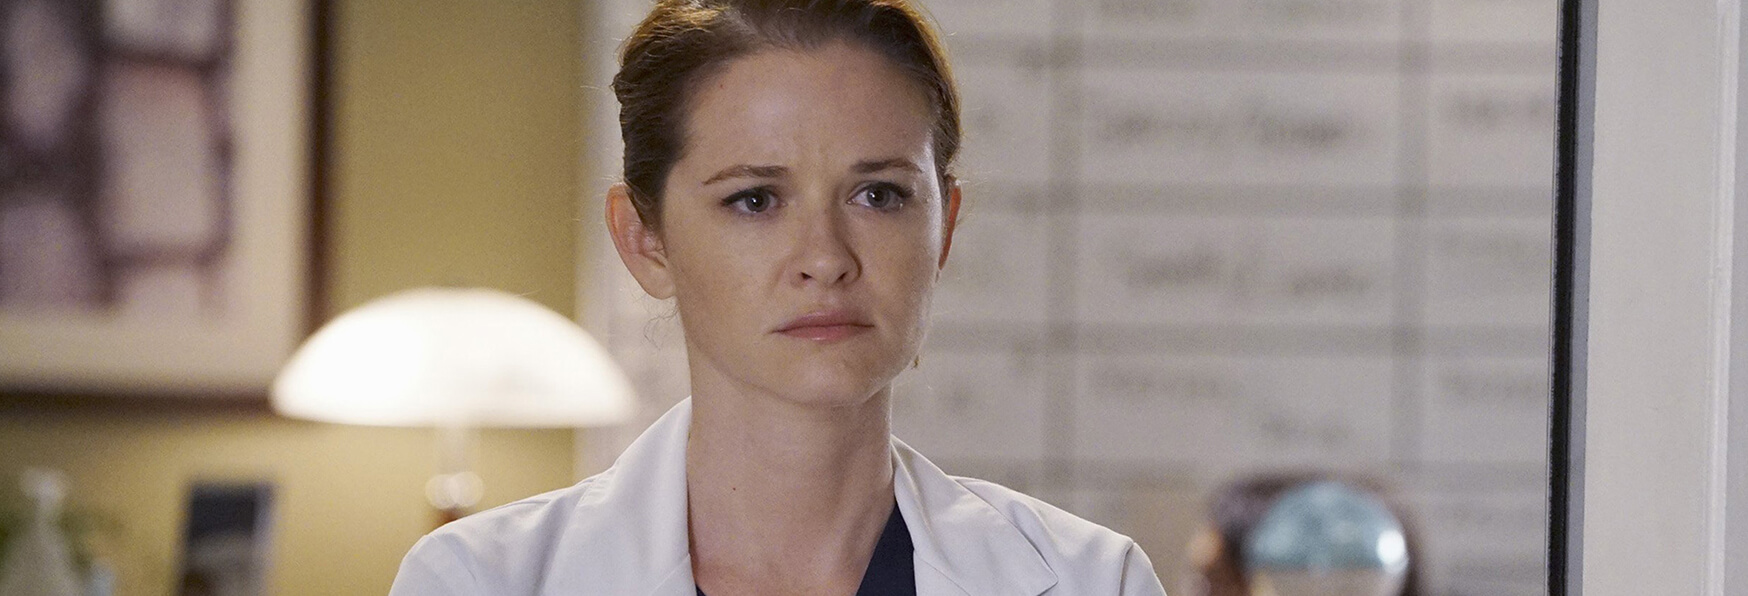 Il doloroso addio di Sarah Drew a Grey's Anatomy